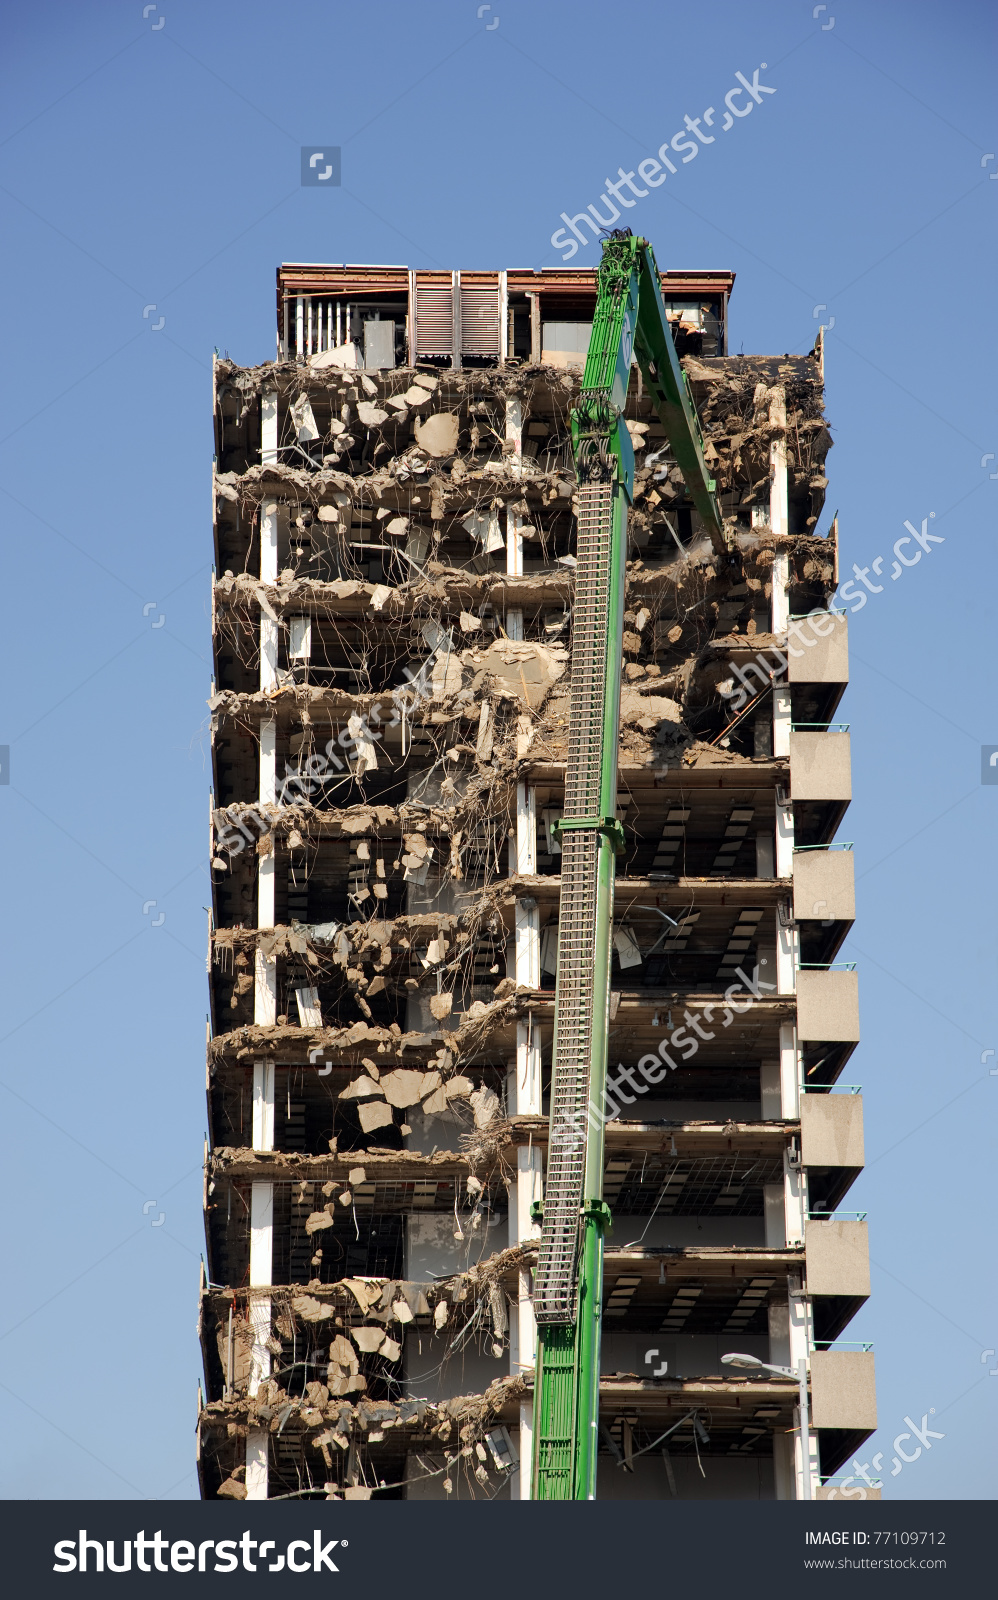 Green Crane Demolishing A Highrise Building Stock Photo 77109712.